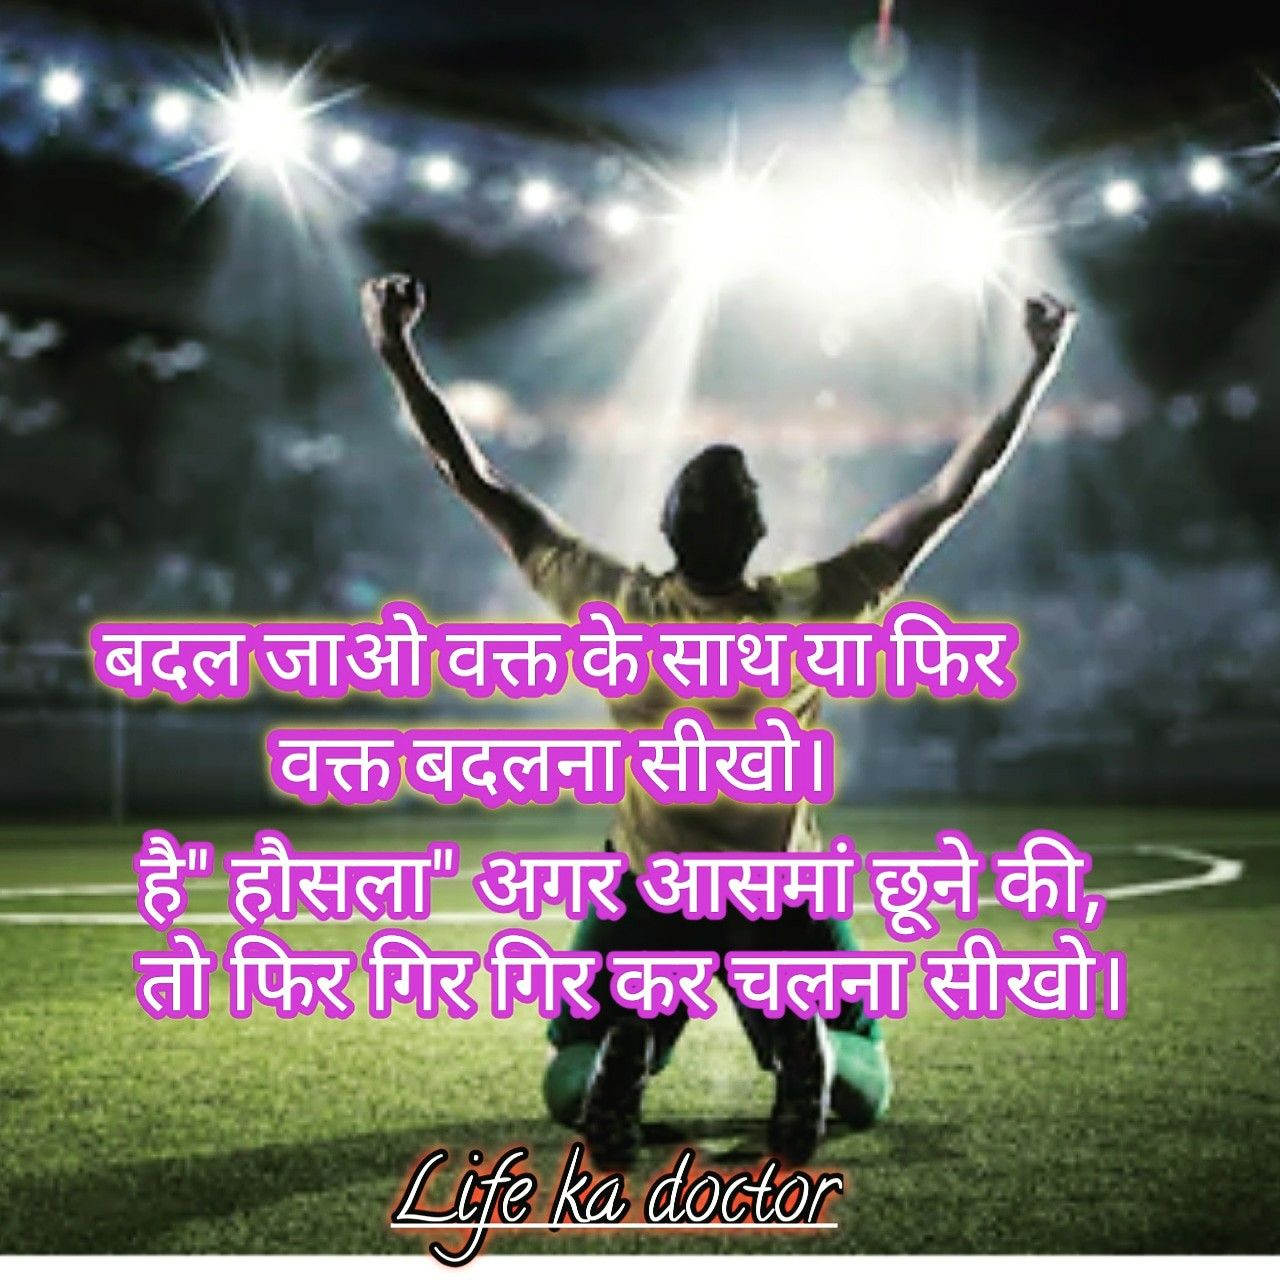 Life Ka Doctor Motivational Quotes In Hindi Inspirational Quotes In Hindi Motivational Quotes For Life